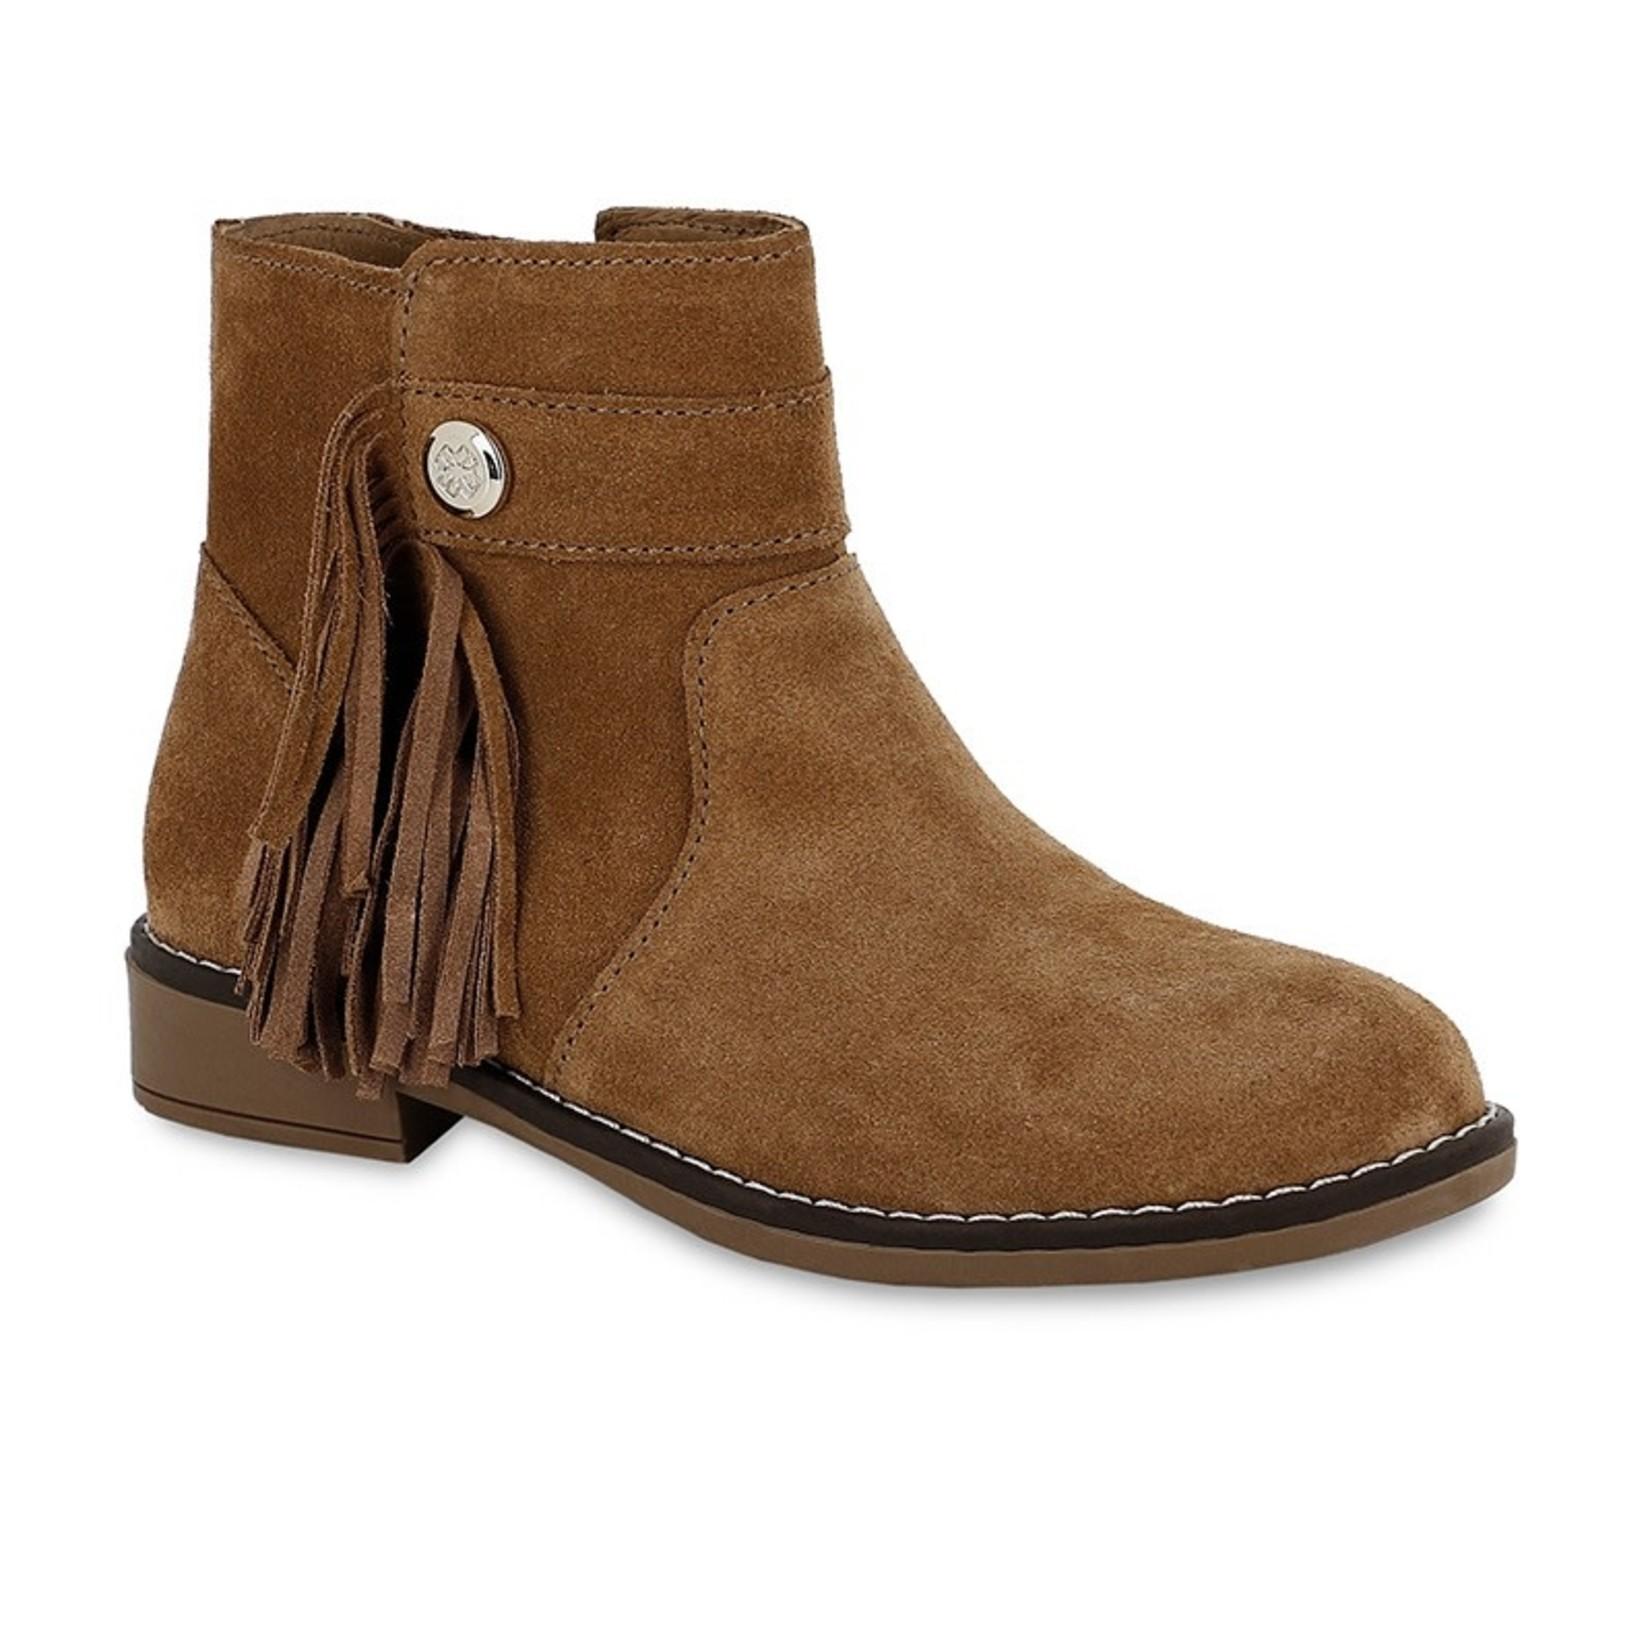 Mayoral Cowboy Boots